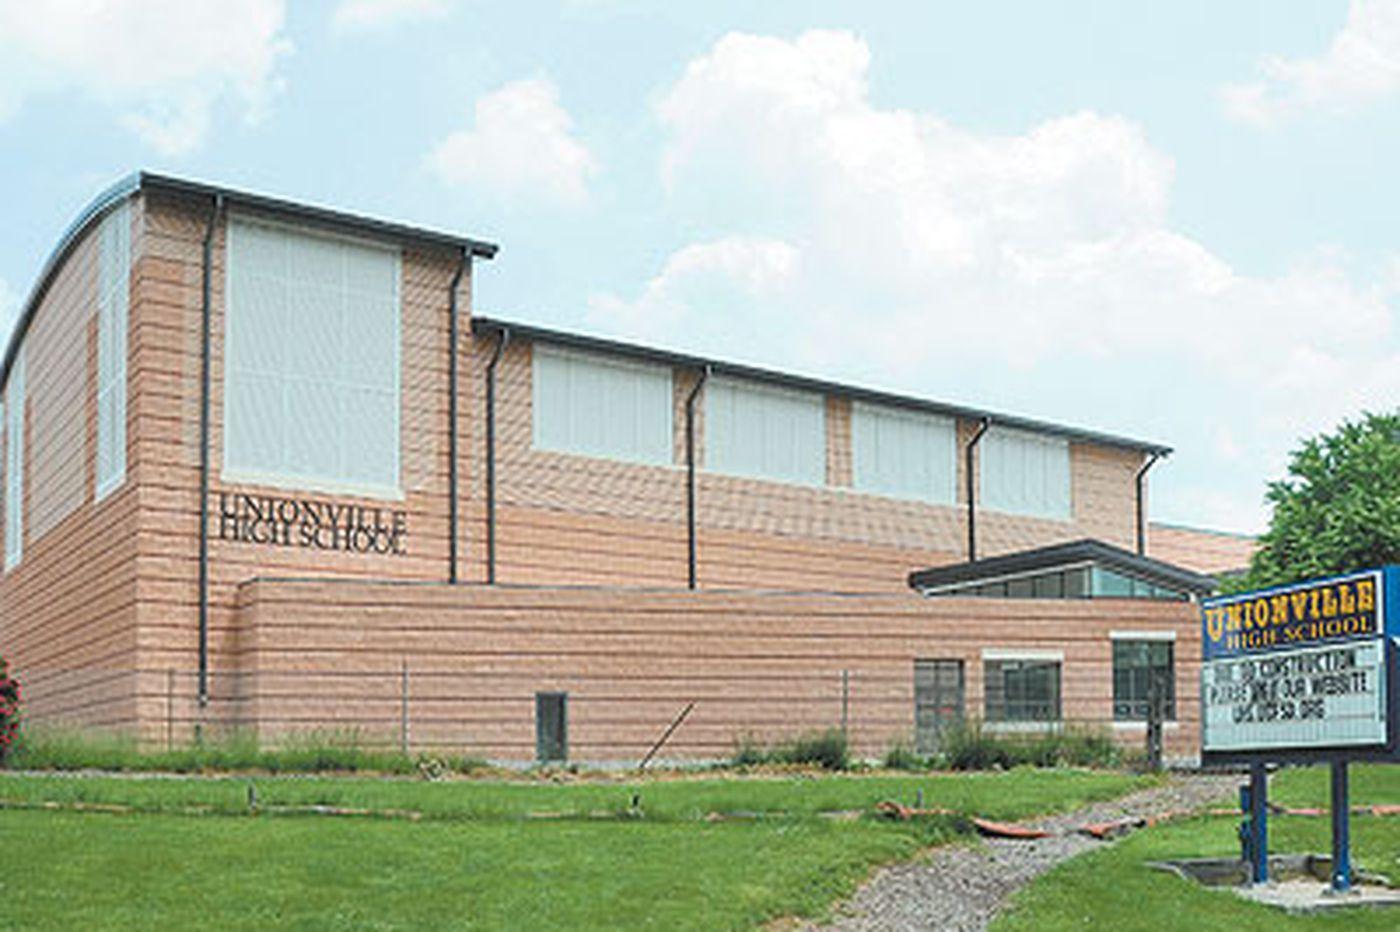 Pennsylvania school project's height stirs dispute